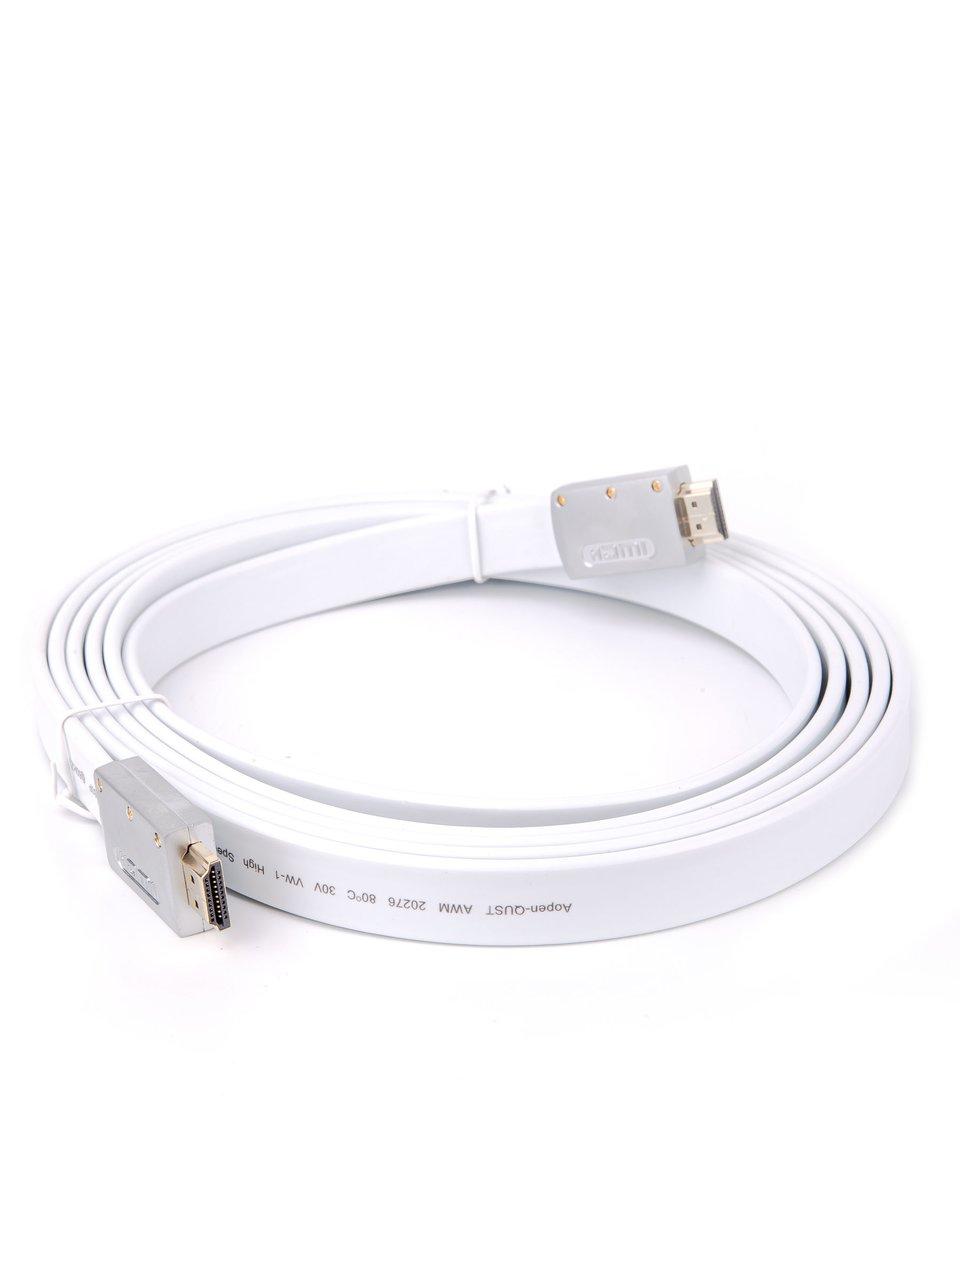 Фото - Кабель HDMI AOpen ACG568F-S-3M, ver 2.0, 3 м, серебряно-белый Flat printio ver thik her ek kom берегись я иду